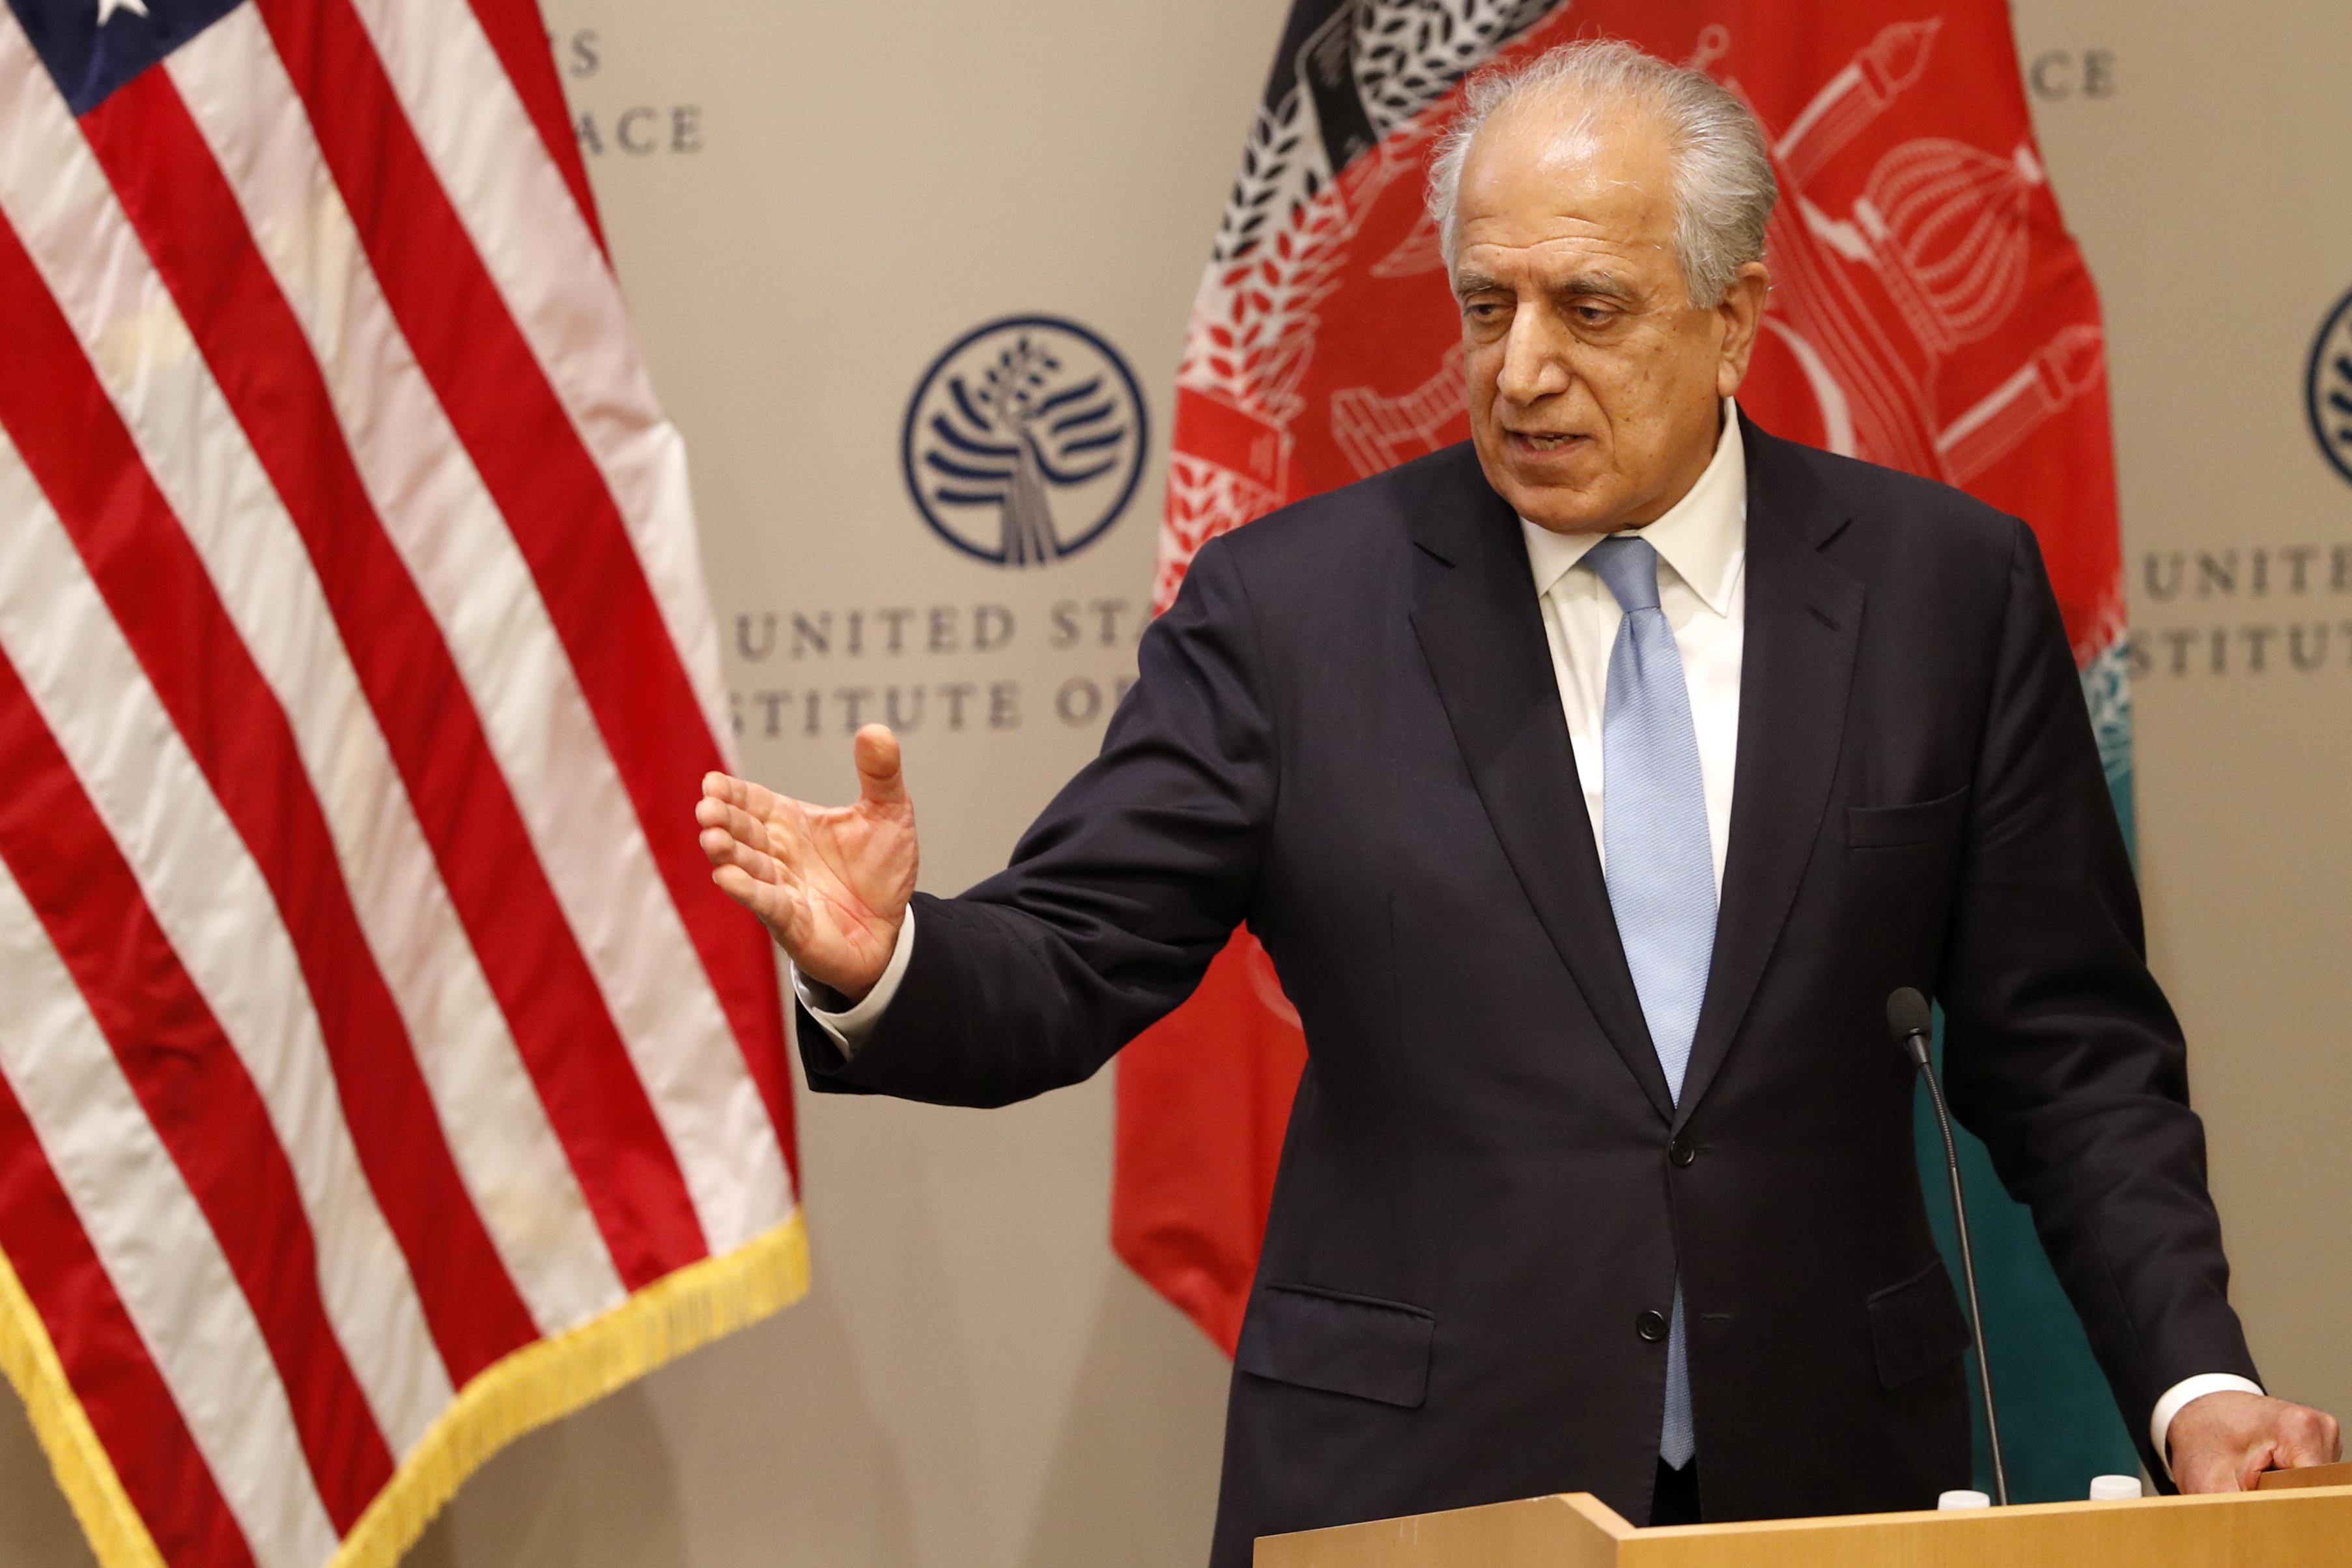 Congress committee subpoenas Trump envoy to Taliban talks